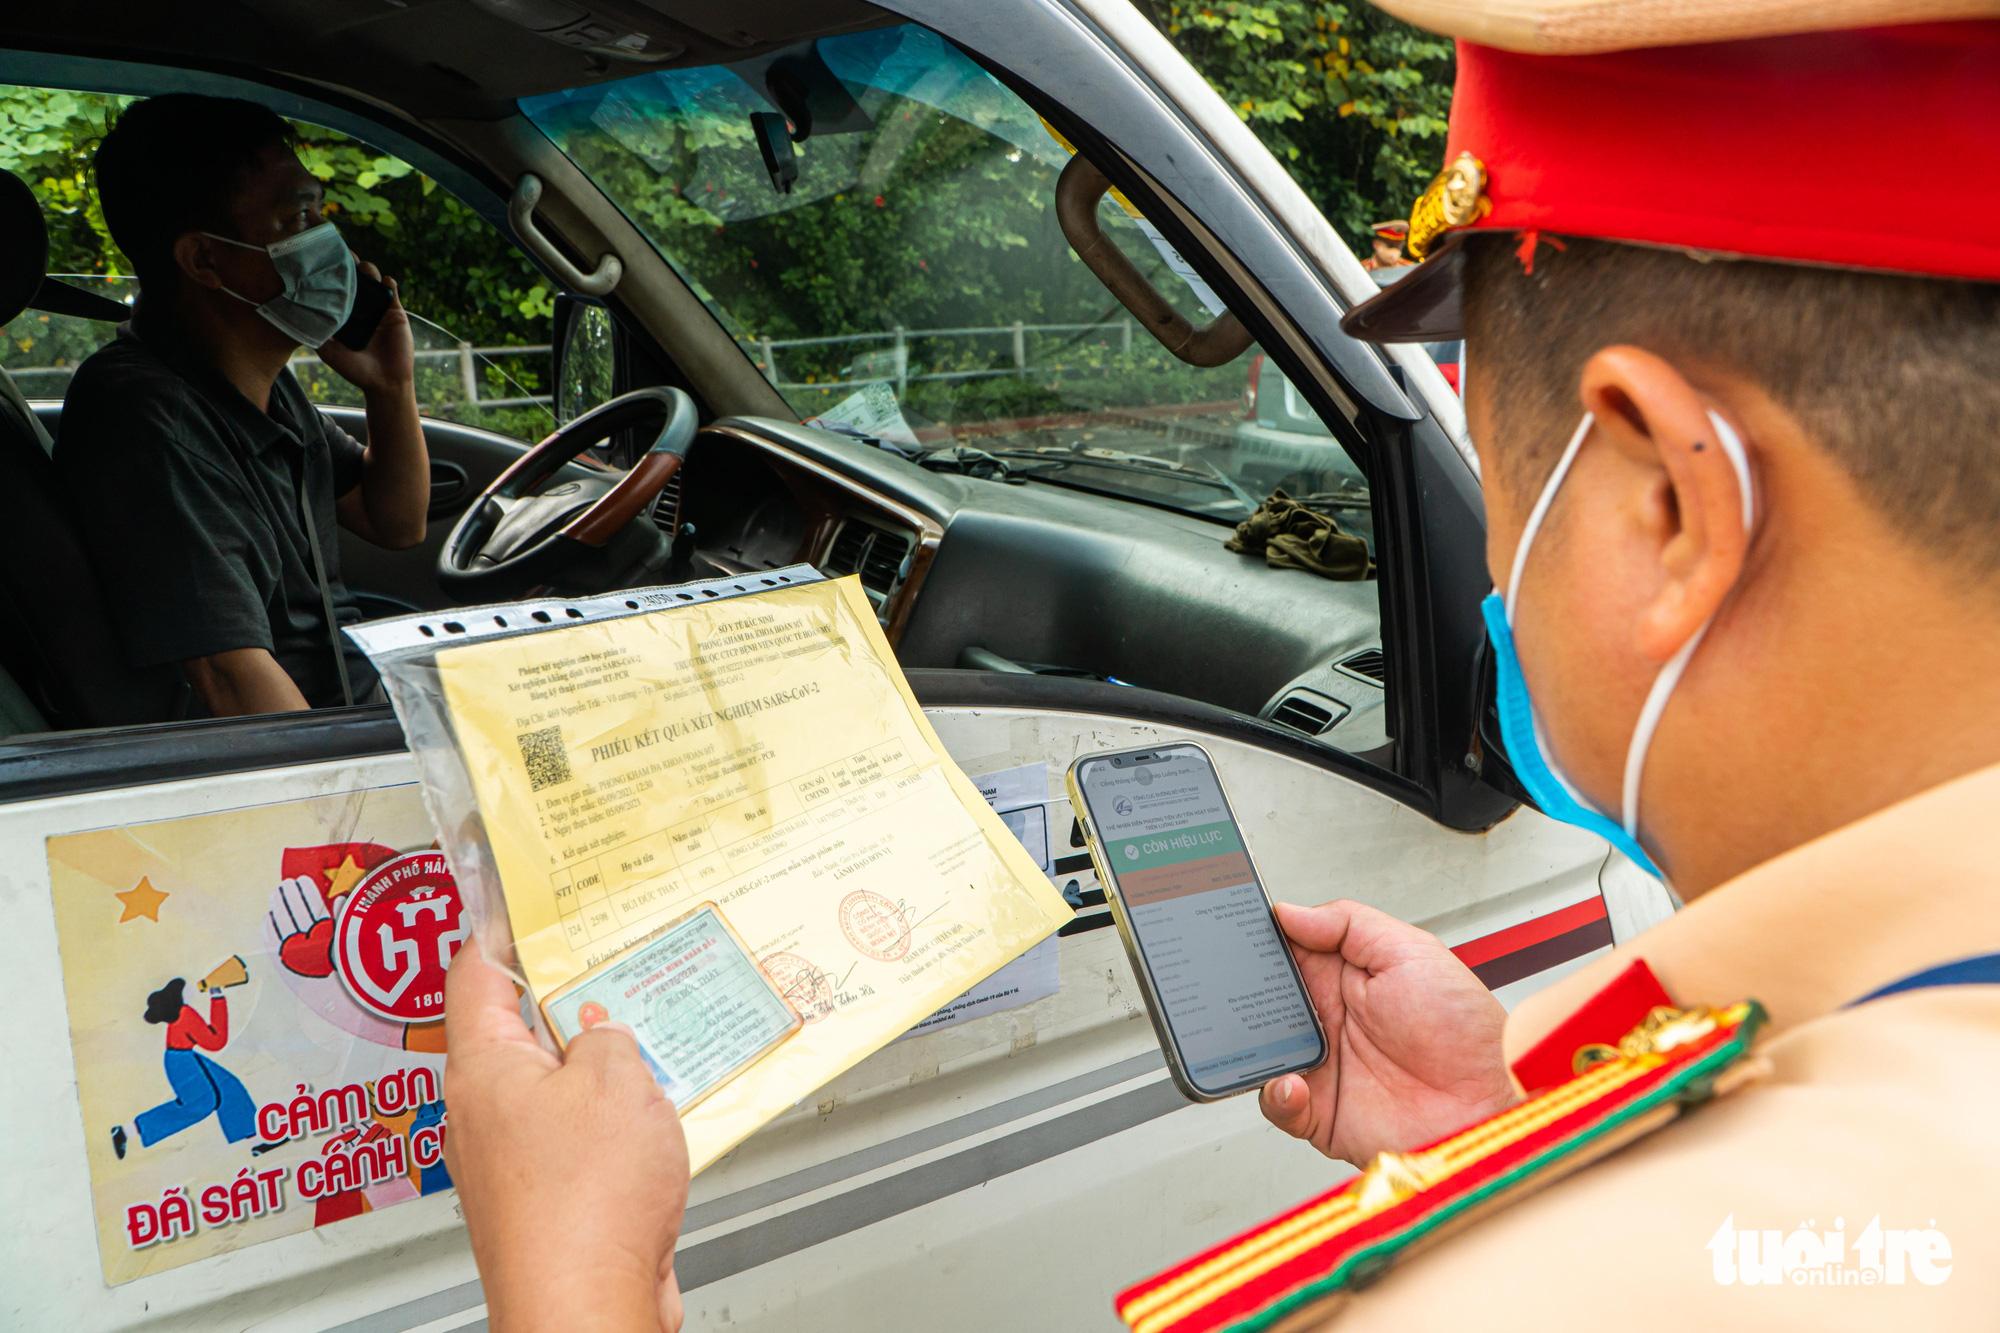 An officer checks documents of a car driver in Hanoi, September 6, 2021. Photo: Pham Tuan / Tuoi Tre